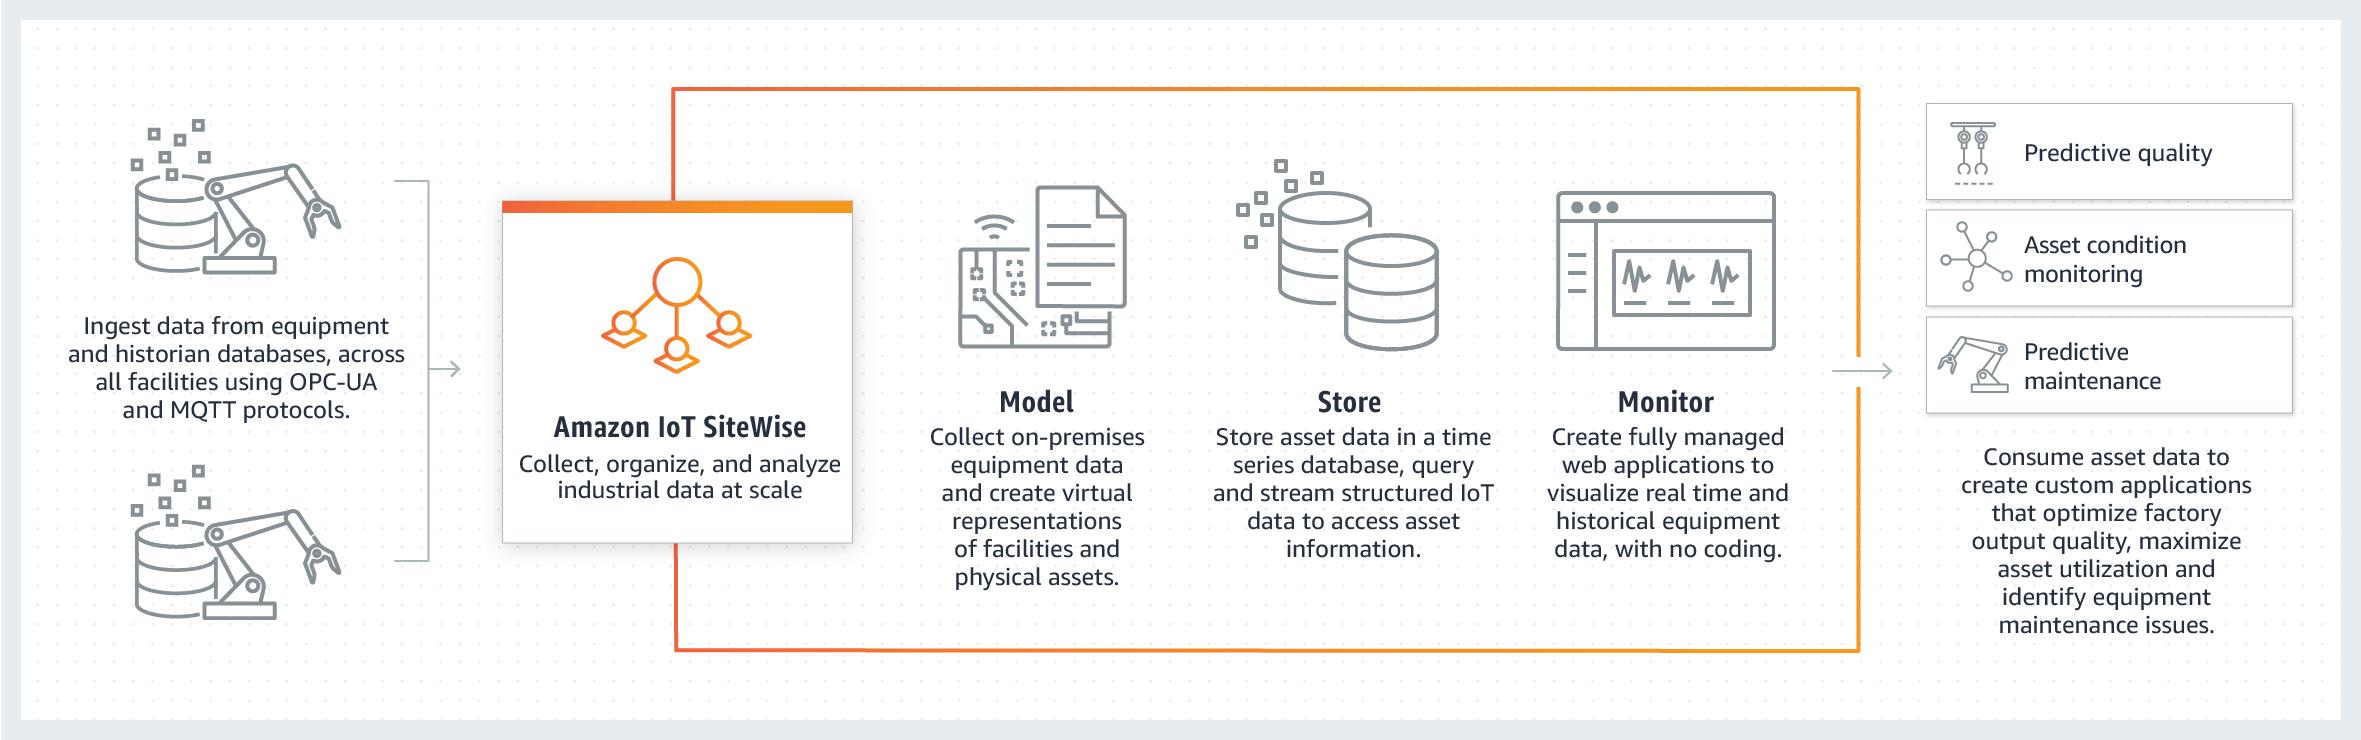 Amazon IoT SiteWise 的工作原理